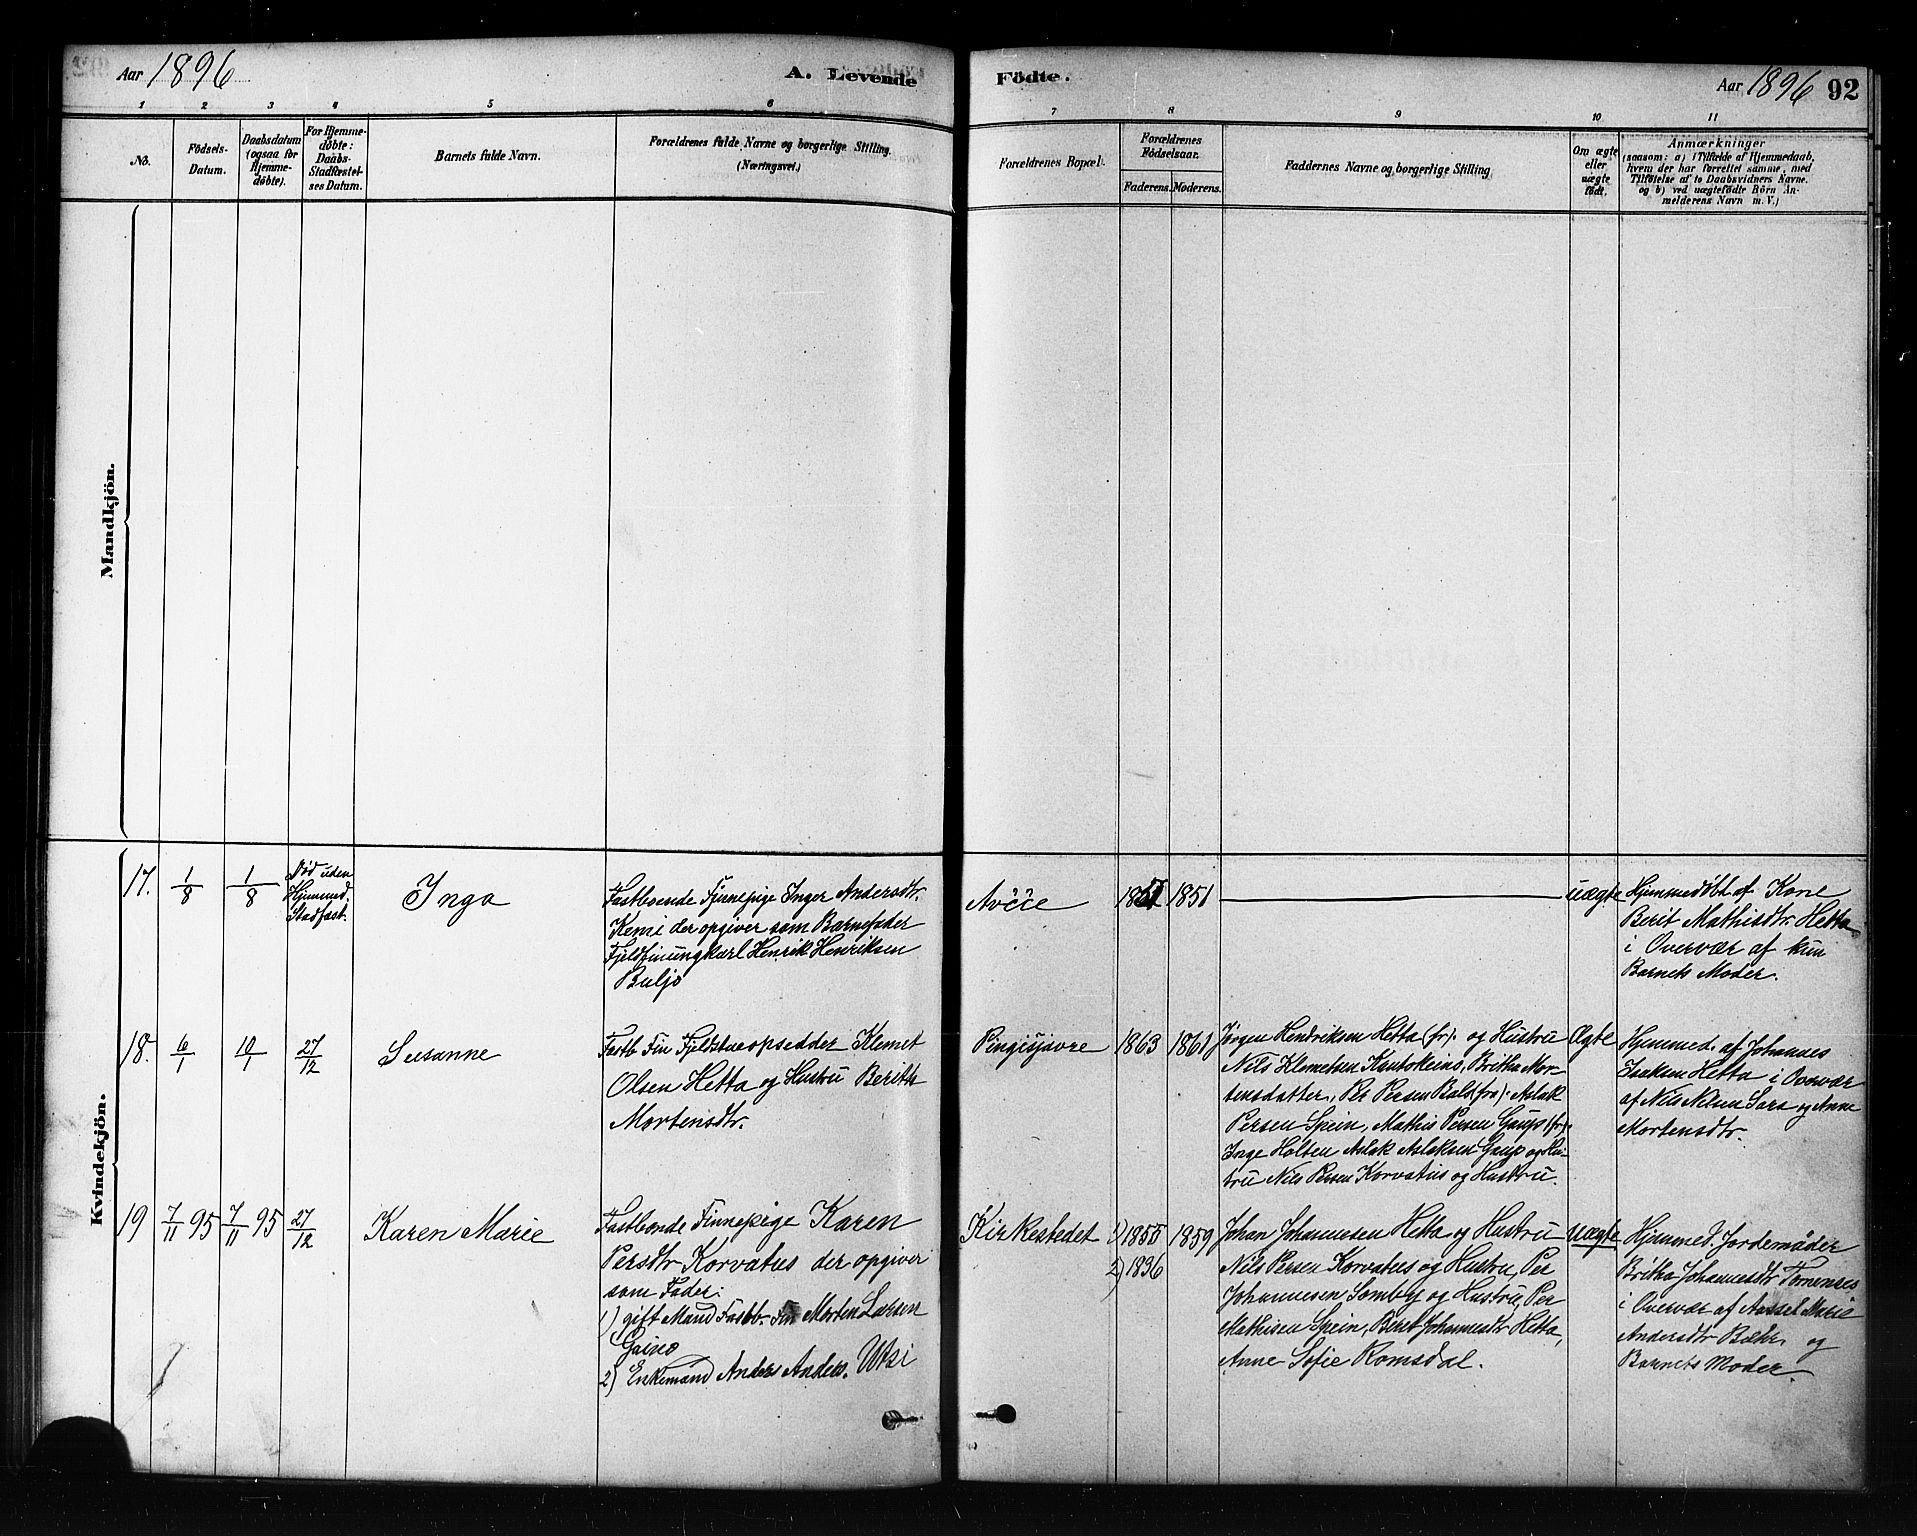 SATØ, Kautokeino sokneprestembete, H/Hb/L0002.klokk: Klokkerbok nr. 2, 1877-1896, s. 92